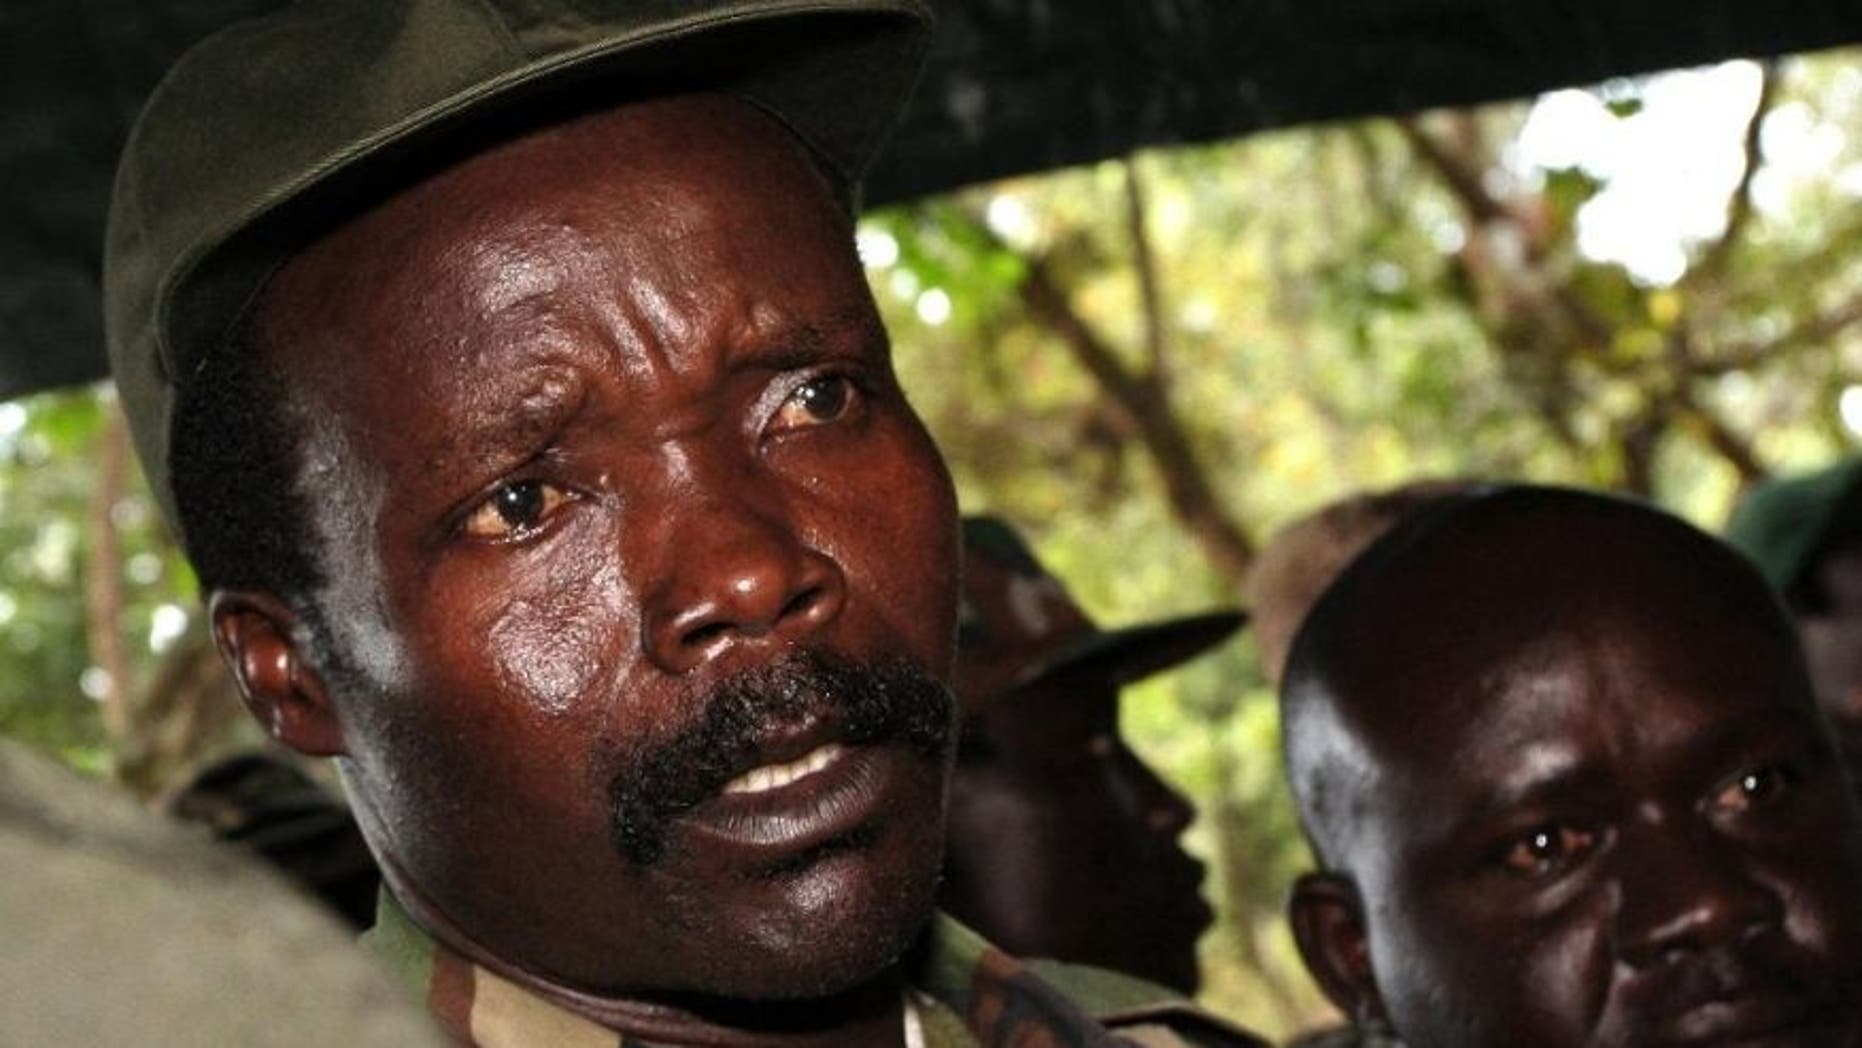 The first-born son of Ugandan warlord Joseph Kony seeks reunion.